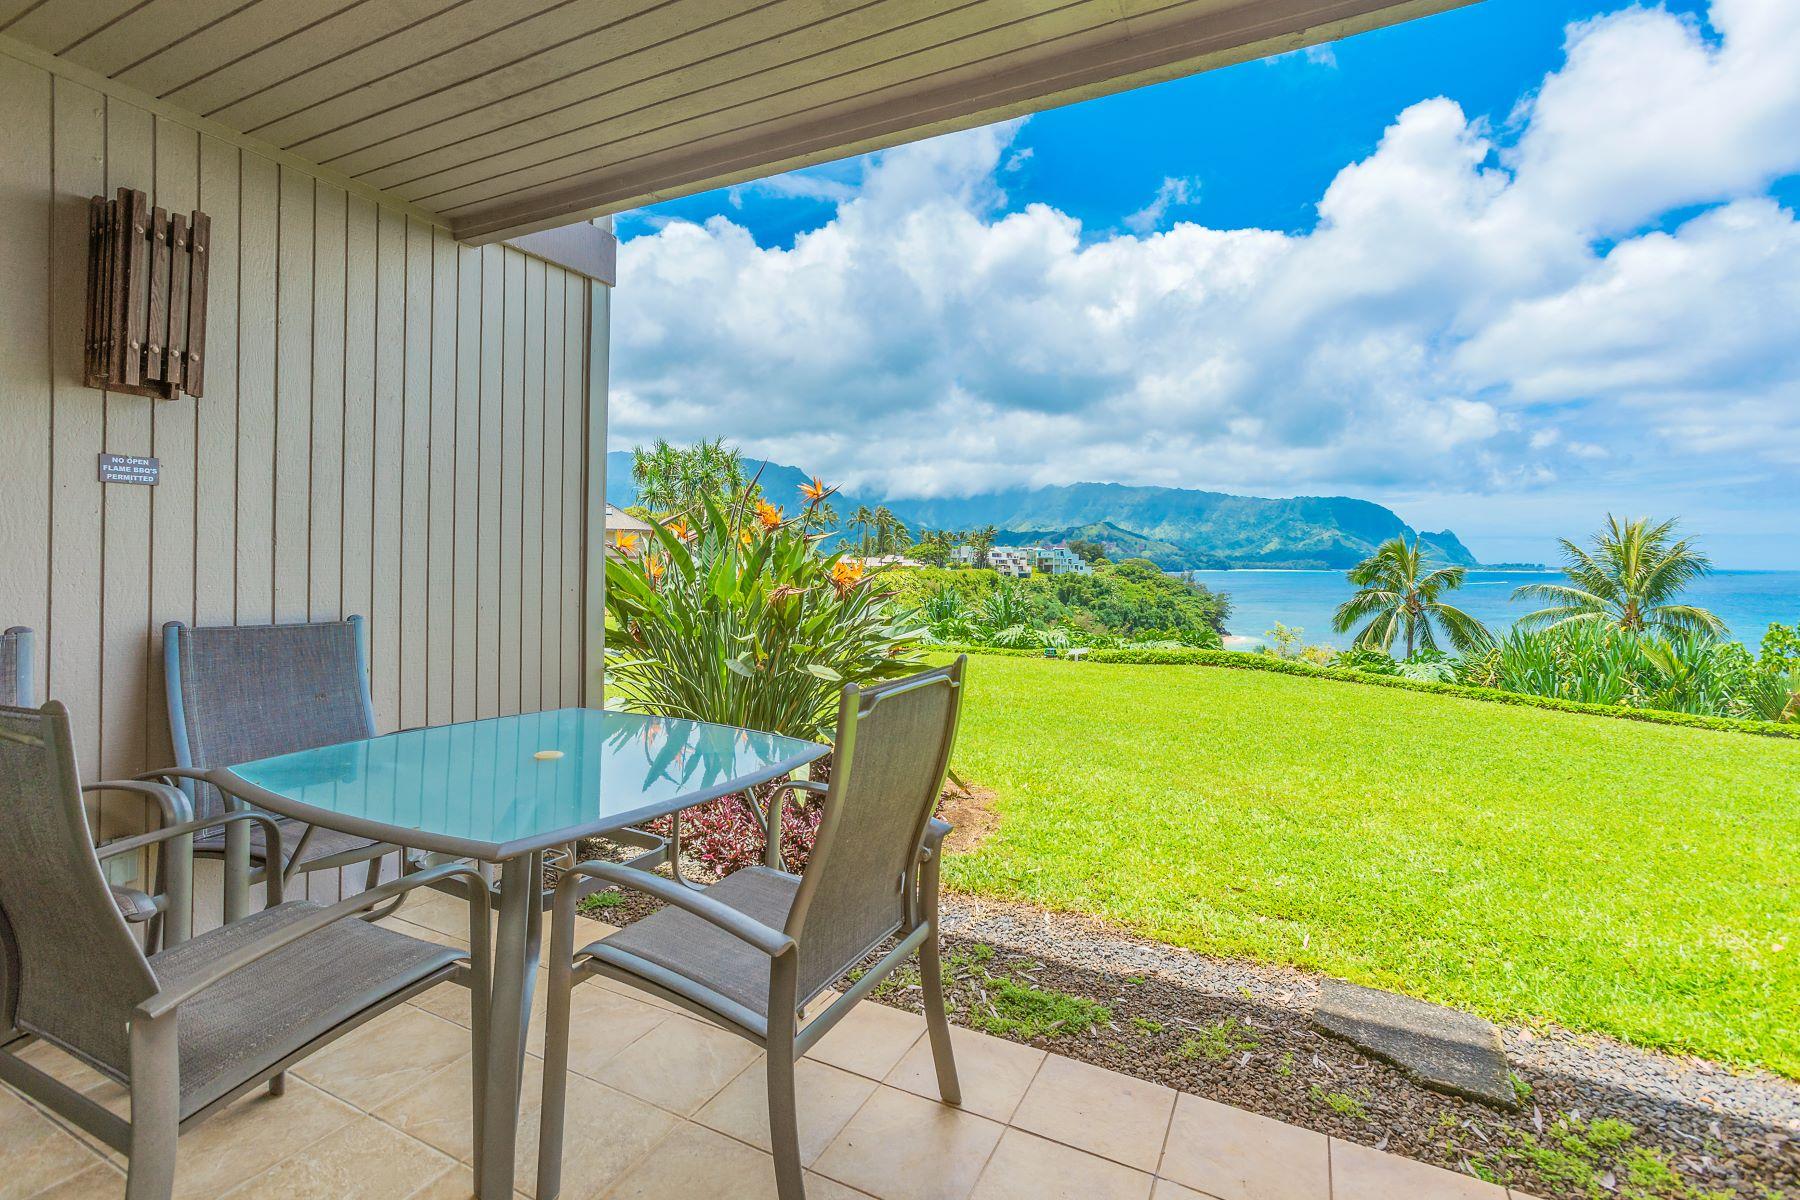 Condominiums for Sale at Pali Ke Kua #114A 5300 Ka Haku Road #114A Princeville, Hawaii 96722 United States